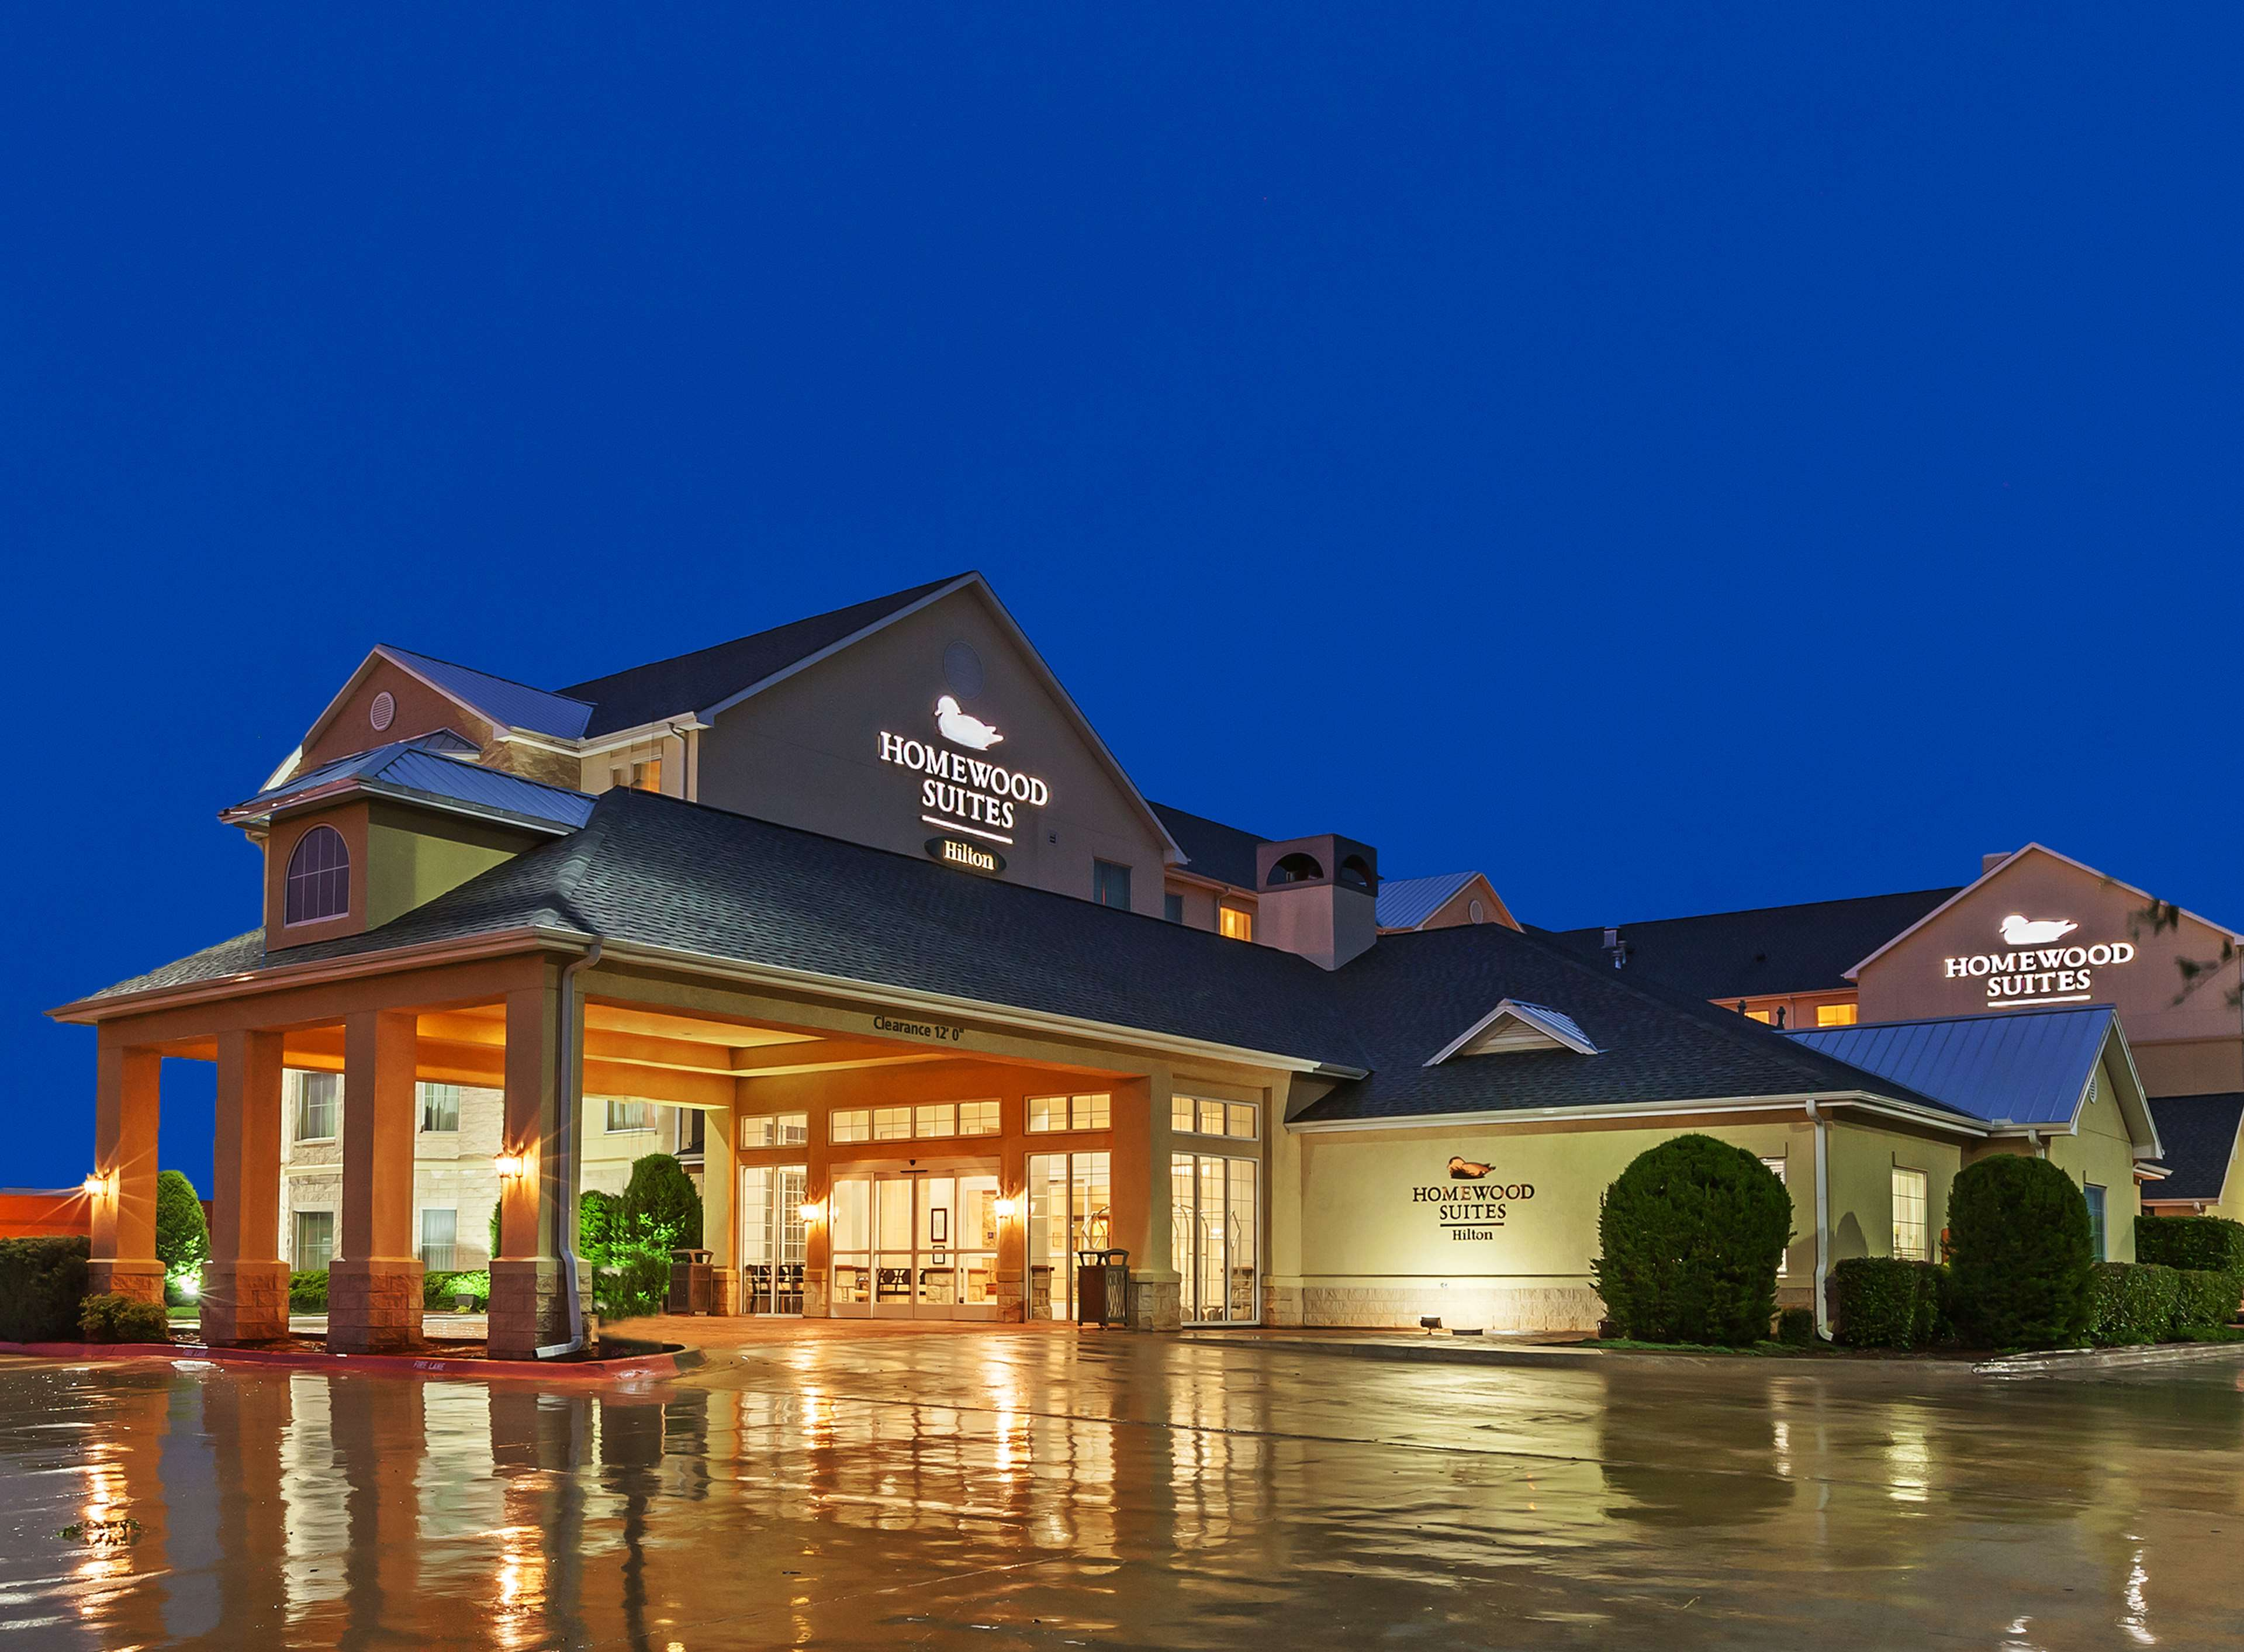 Homewood Suites by Hilton Wichita Falls image 3